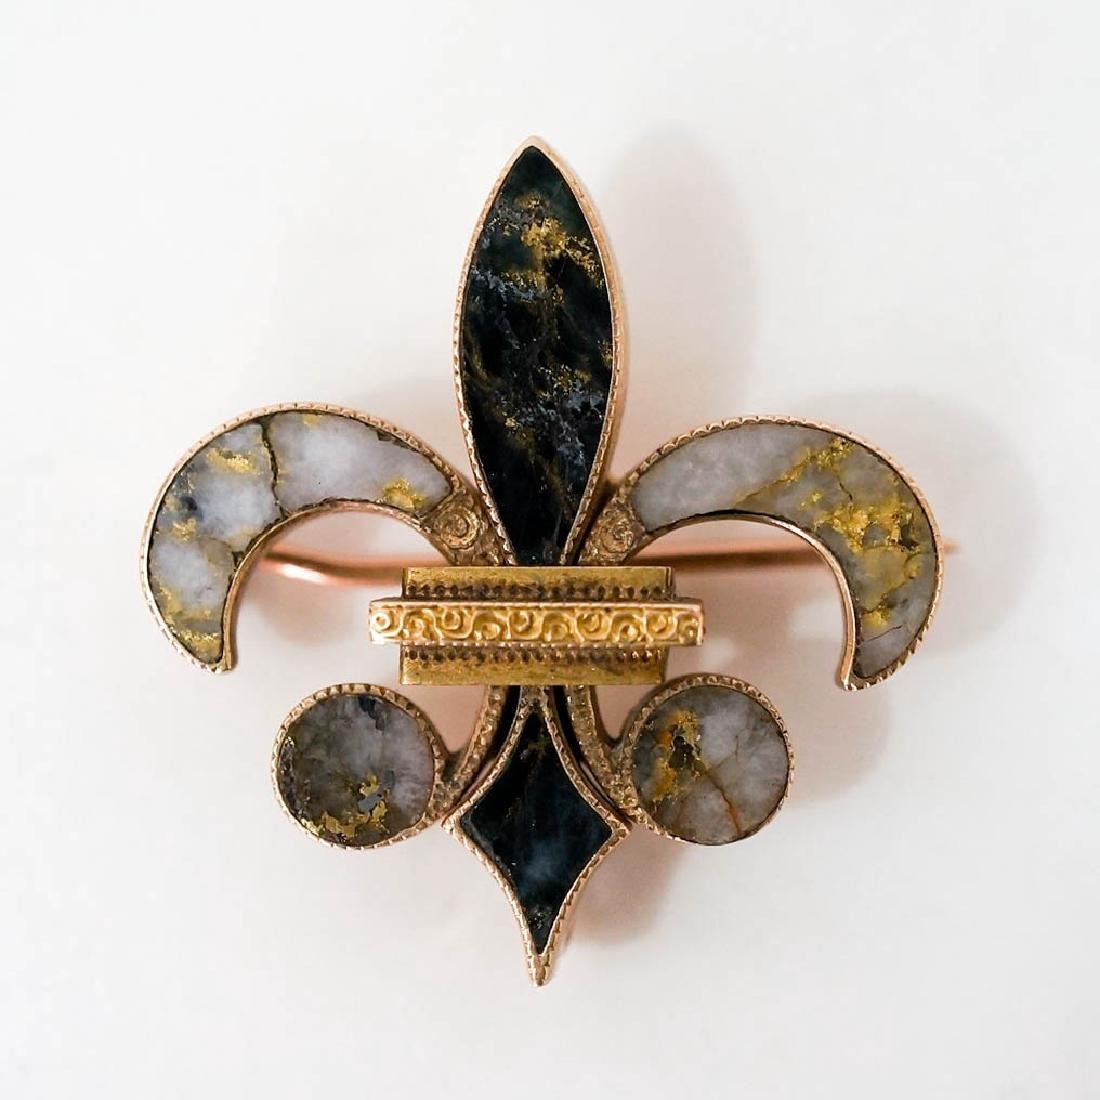 California Quartz in 14k Gold Fleur-de lis Pin